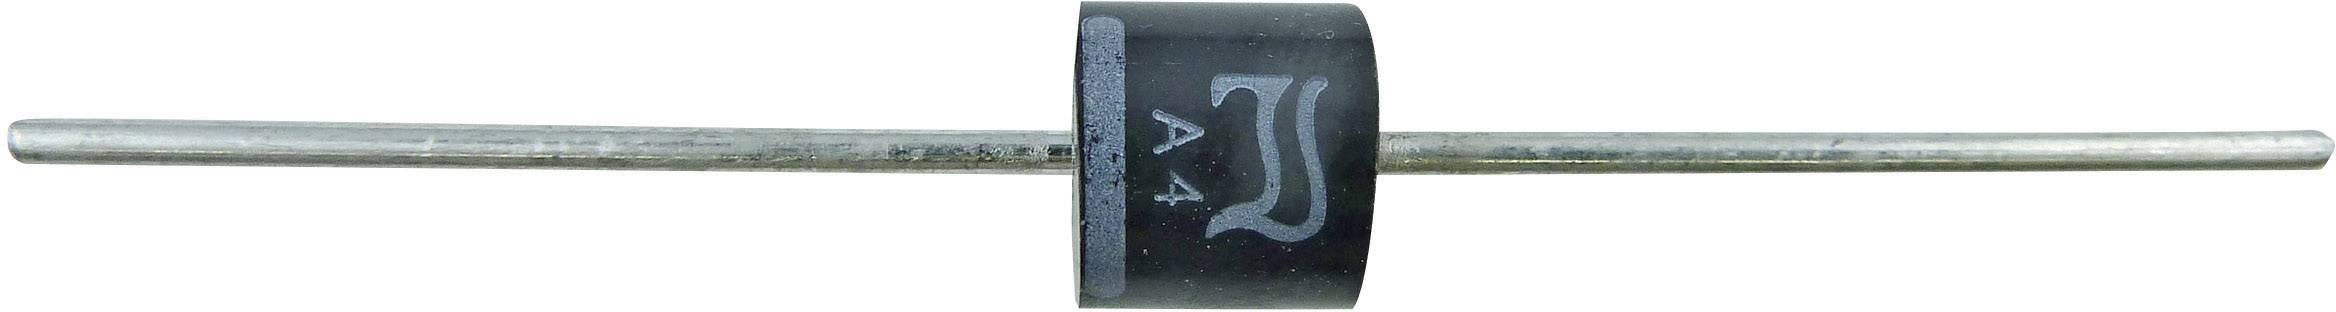 Dioda Diotec P1000D, I(F) 10 A, U(R) 200 V